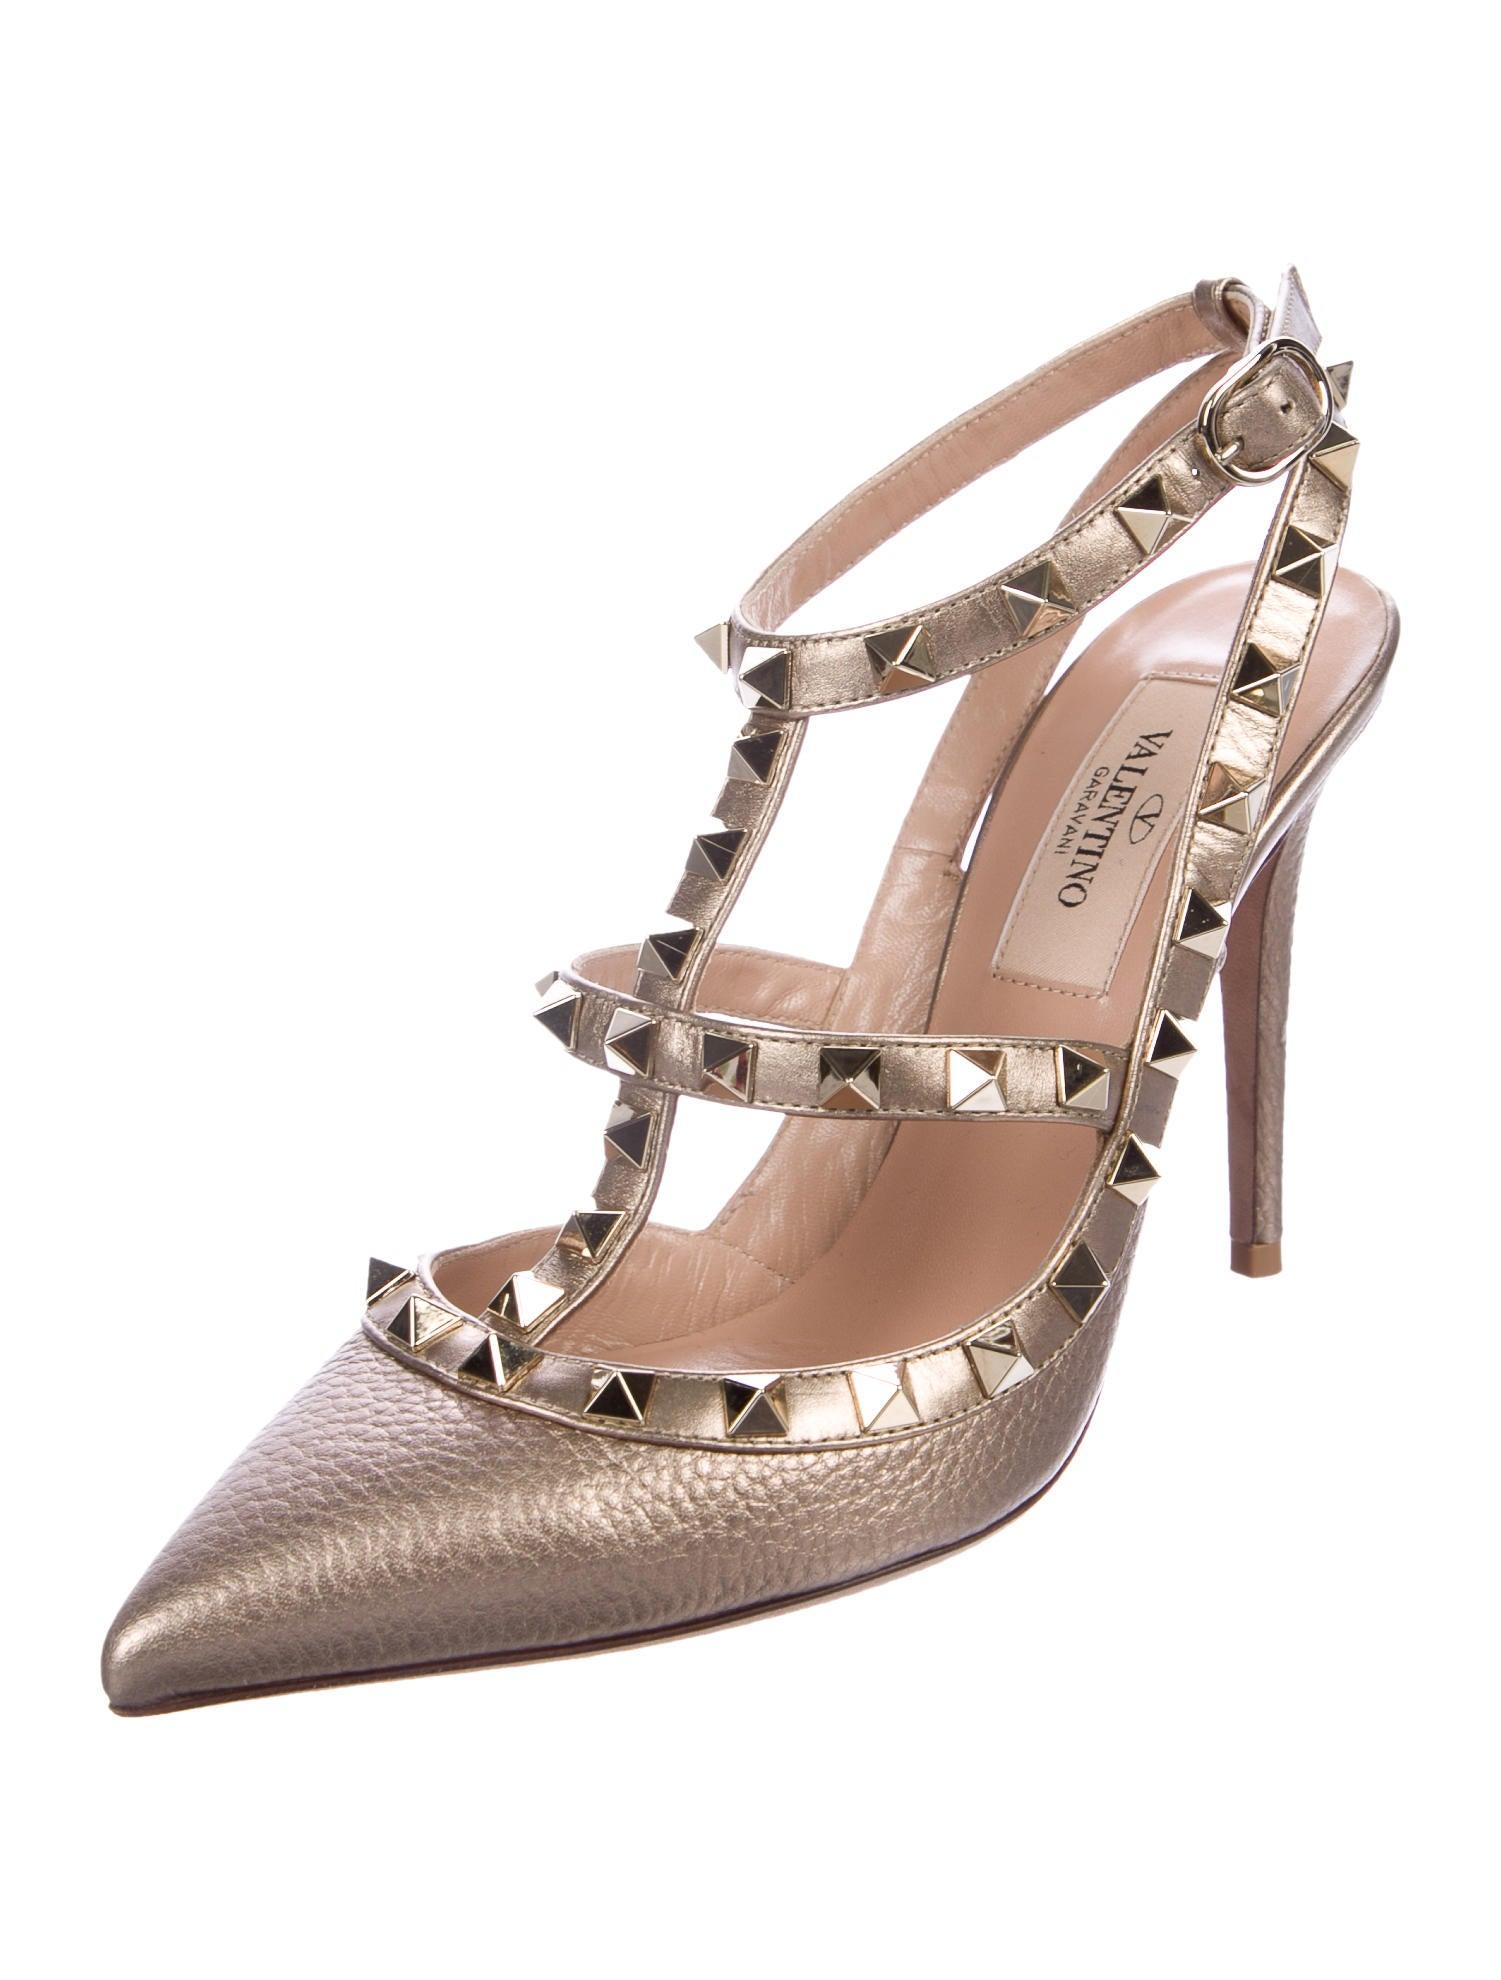 valentino metallic rockstud pumps shoes val72151 the. Black Bedroom Furniture Sets. Home Design Ideas